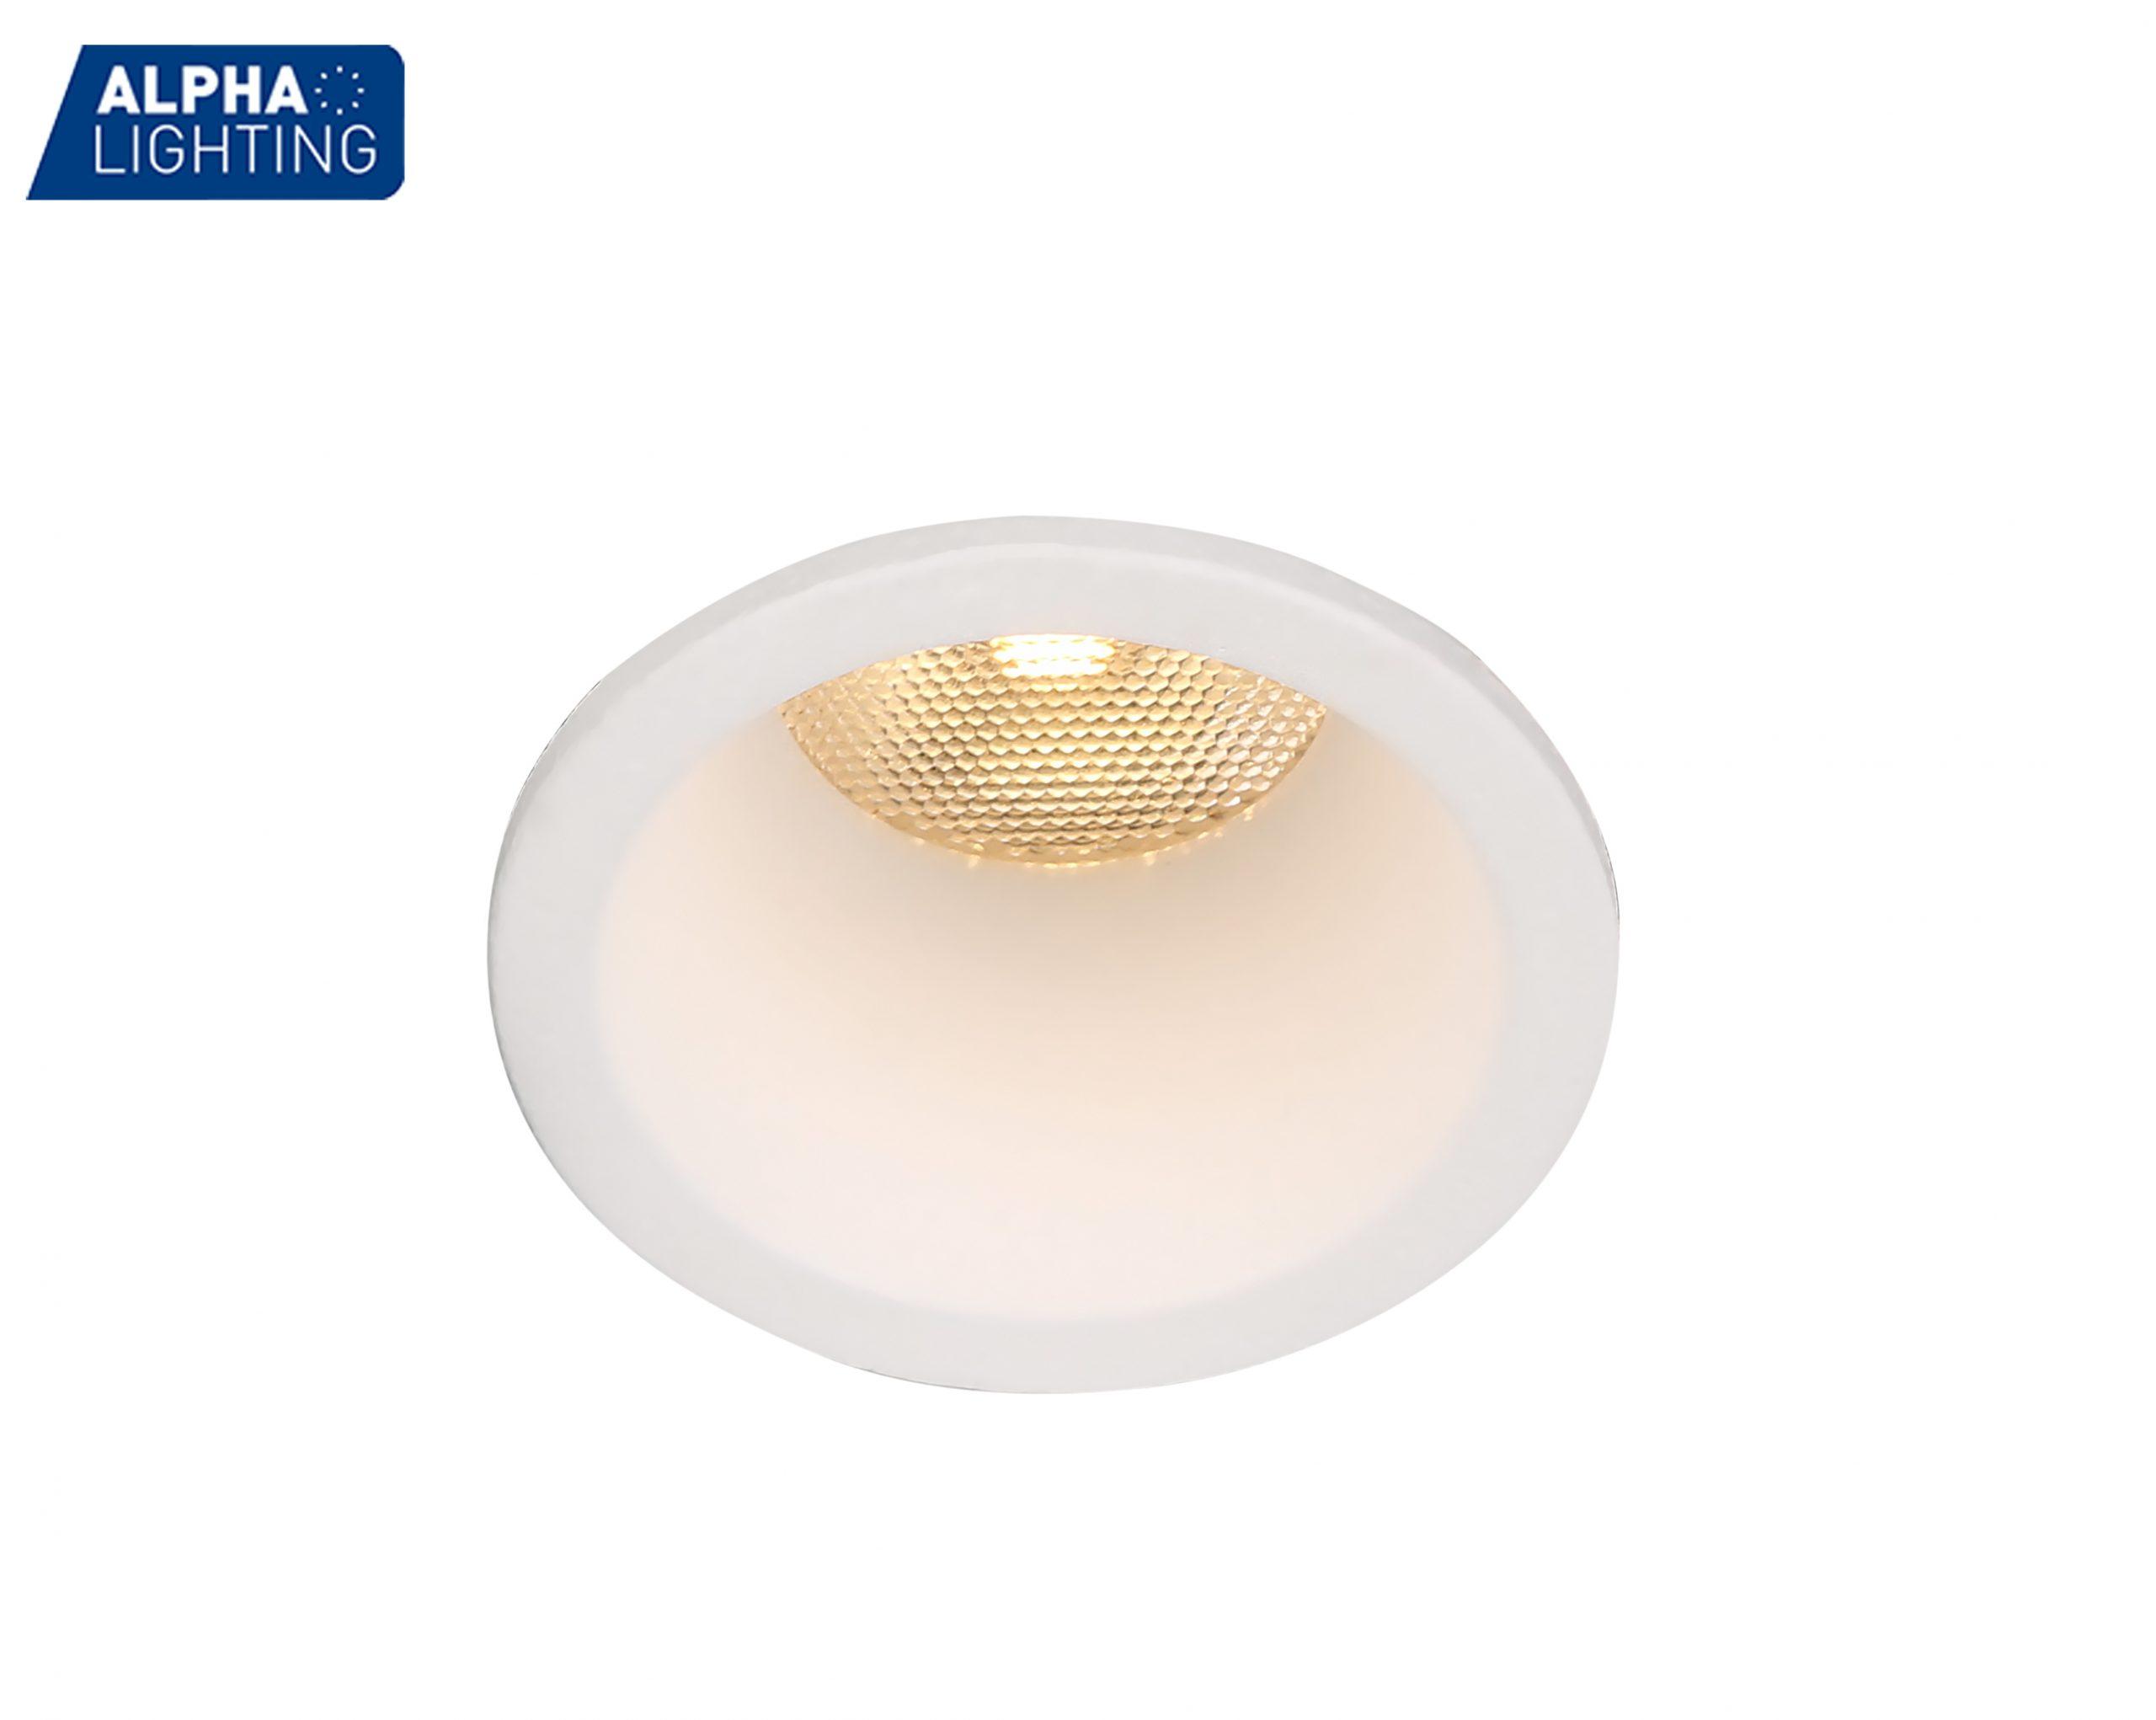 Recessed led downlight-ALDL0962